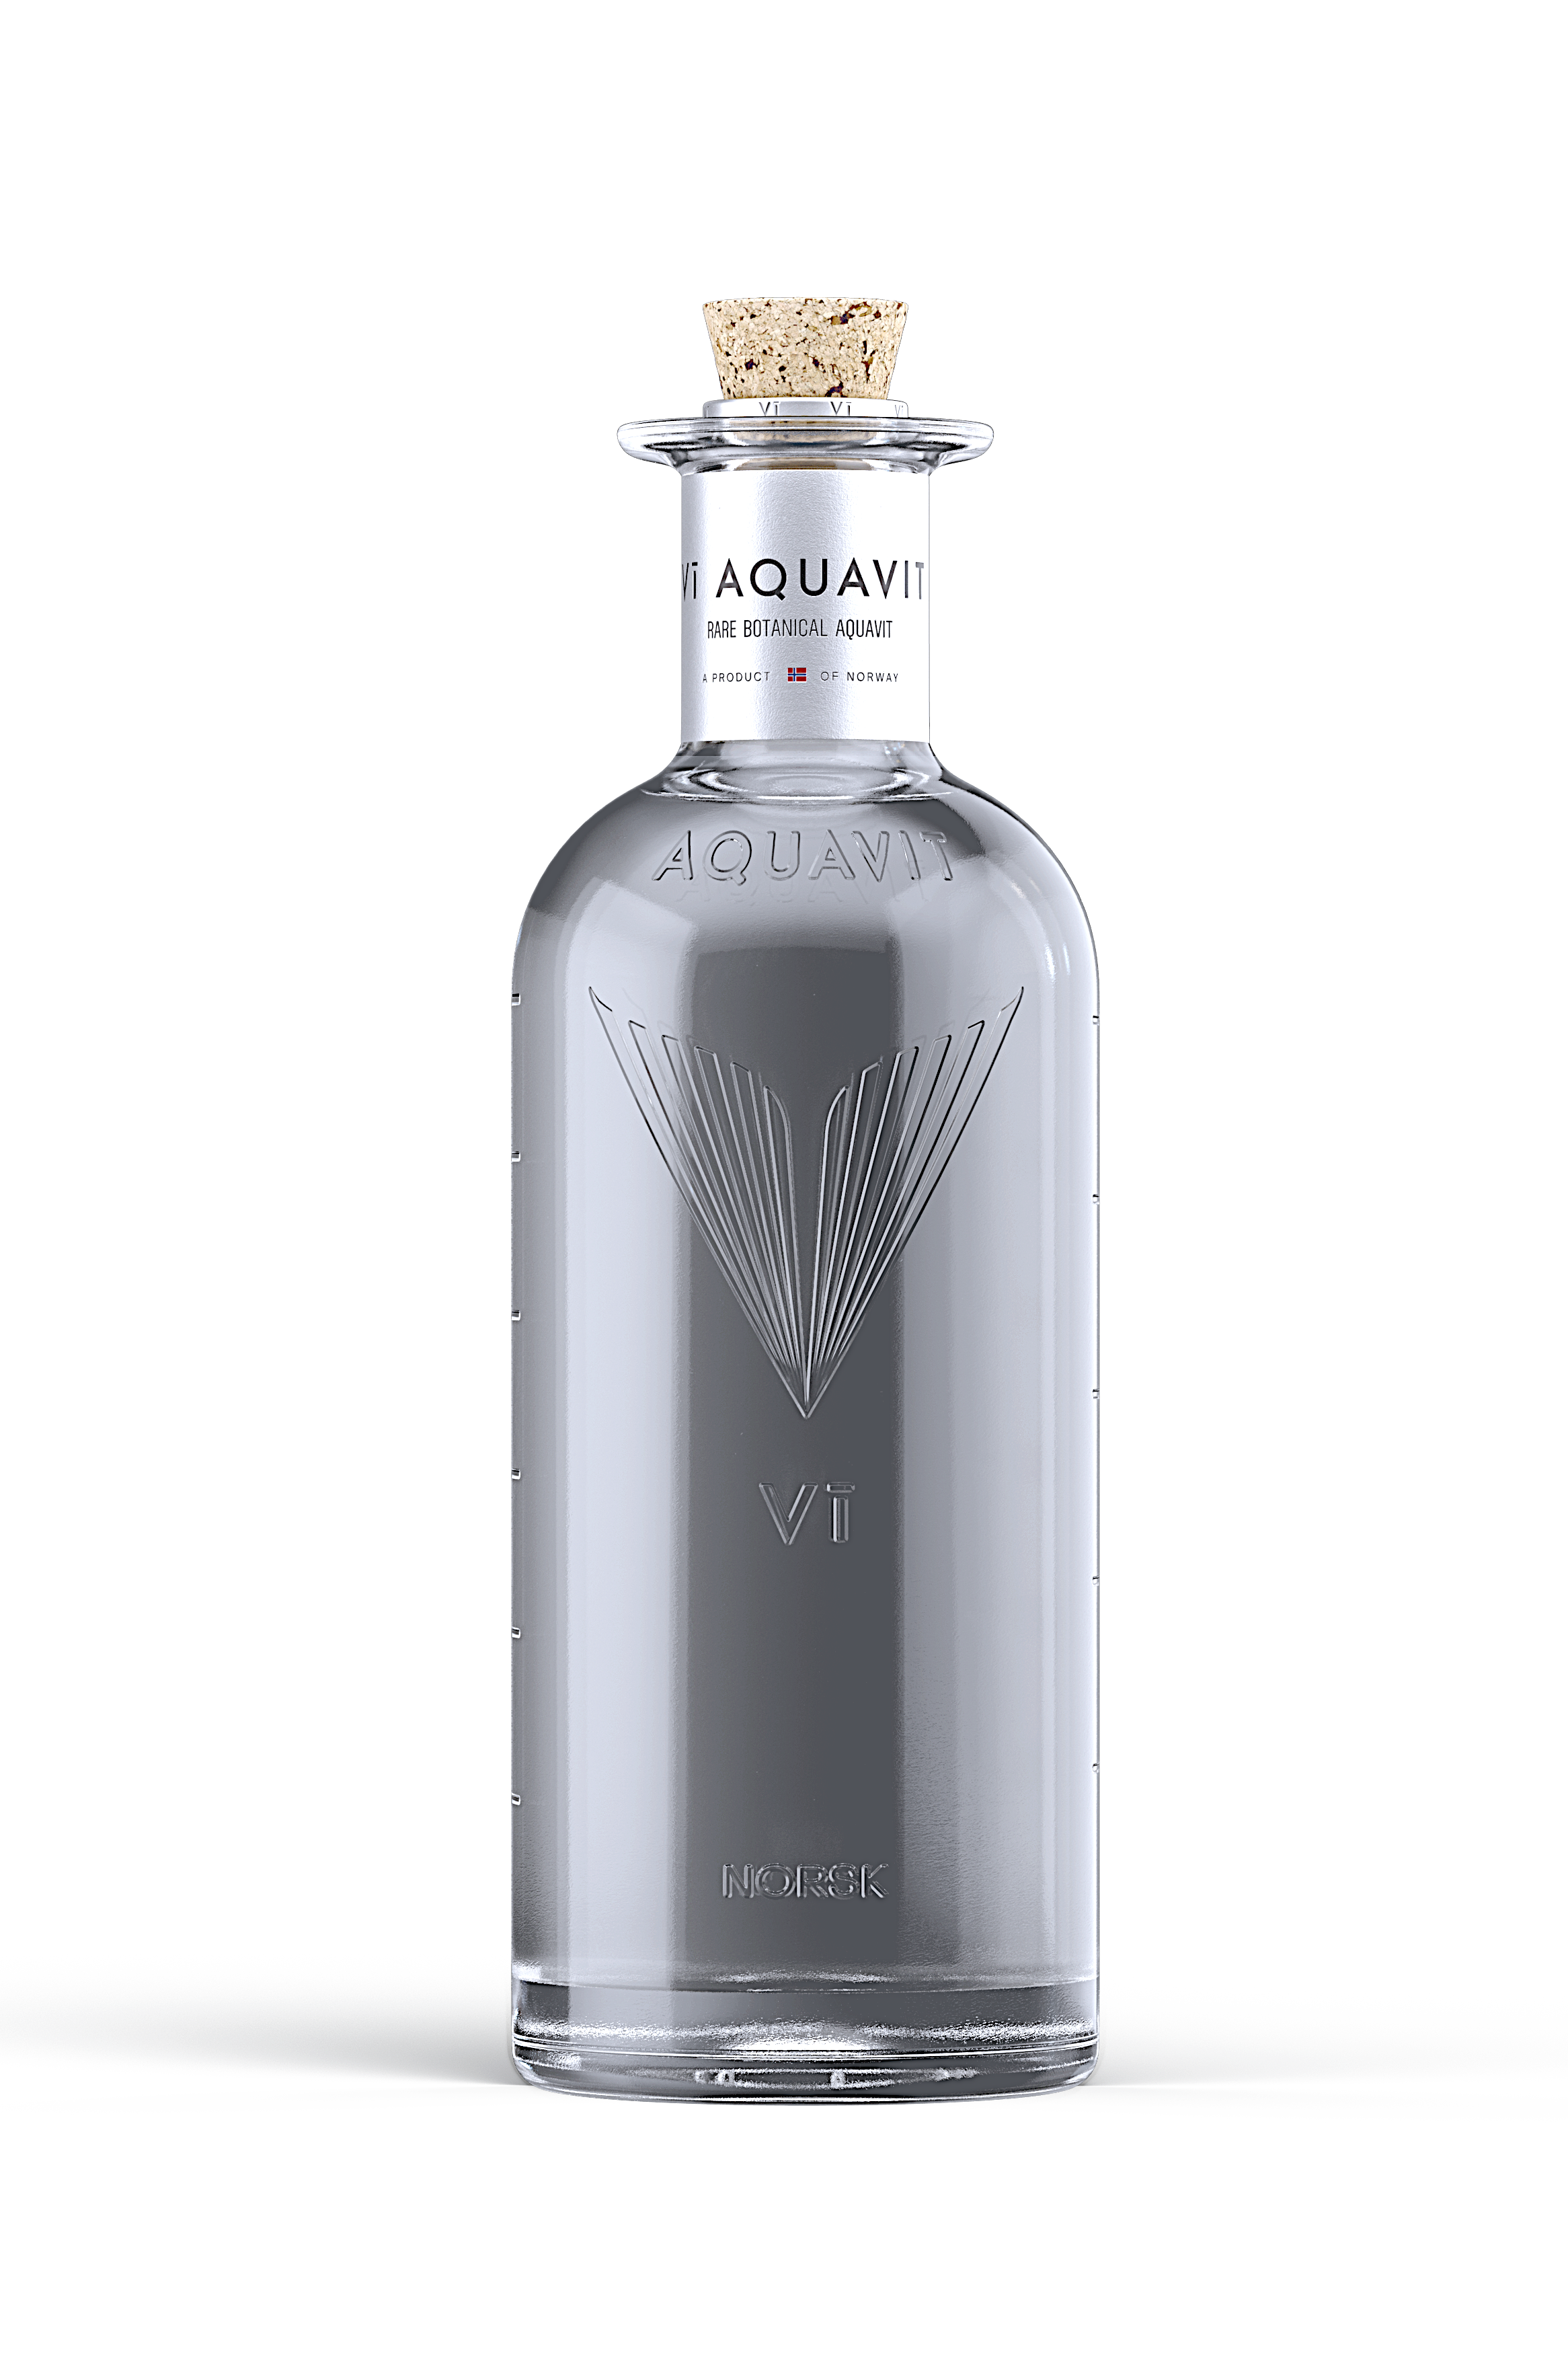 Vi_Aquavit_3D_bottle_Front_Black_transparent_shadow_Metric_HR-filtered.png